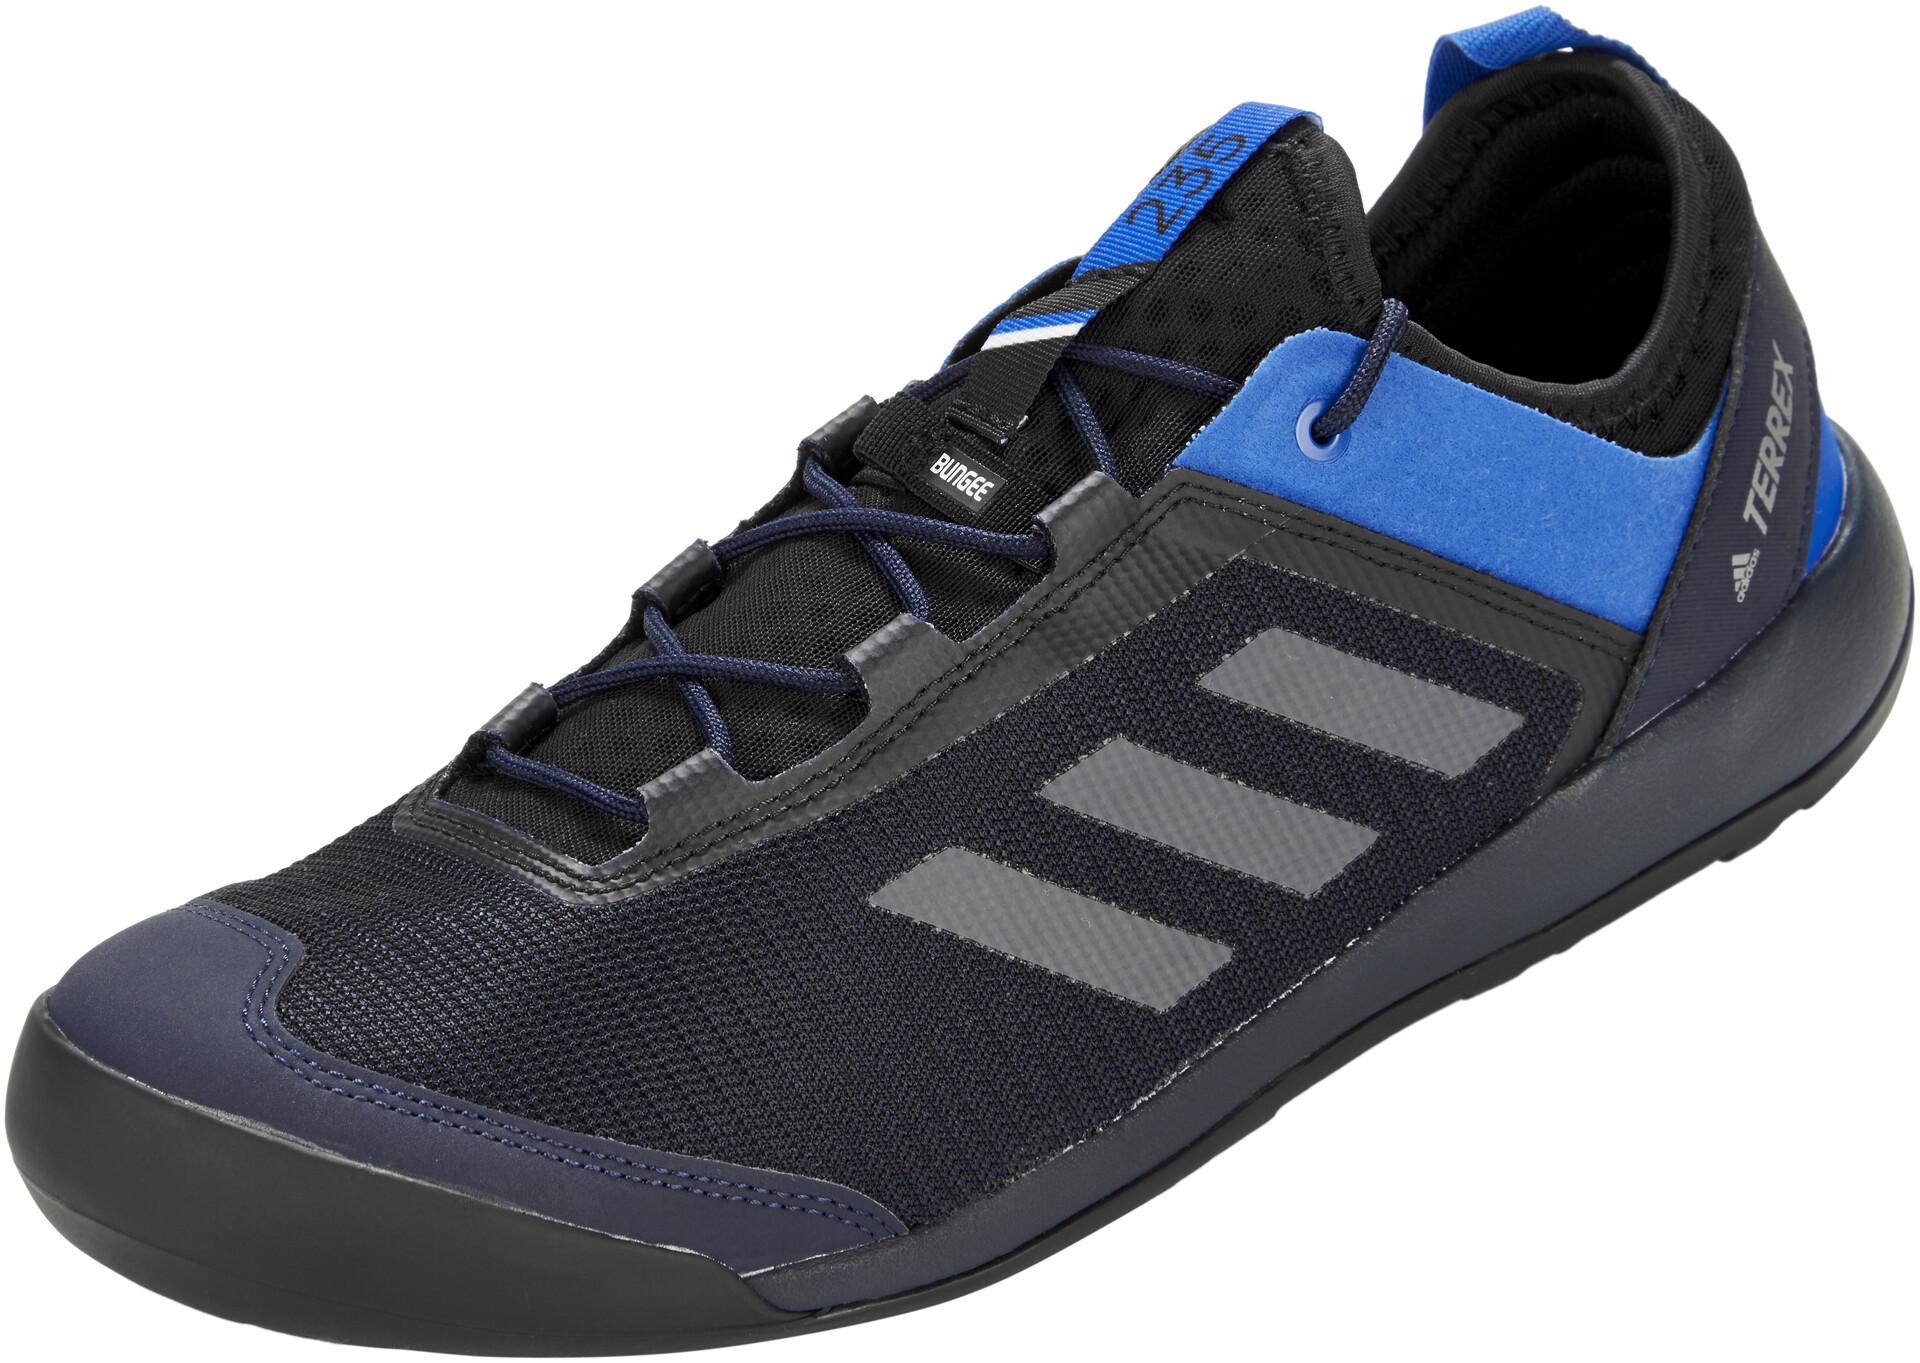 Grisbleu Adidas Homme Campz Terrex Sur Chaussures Swift Solo wwR7qgTB